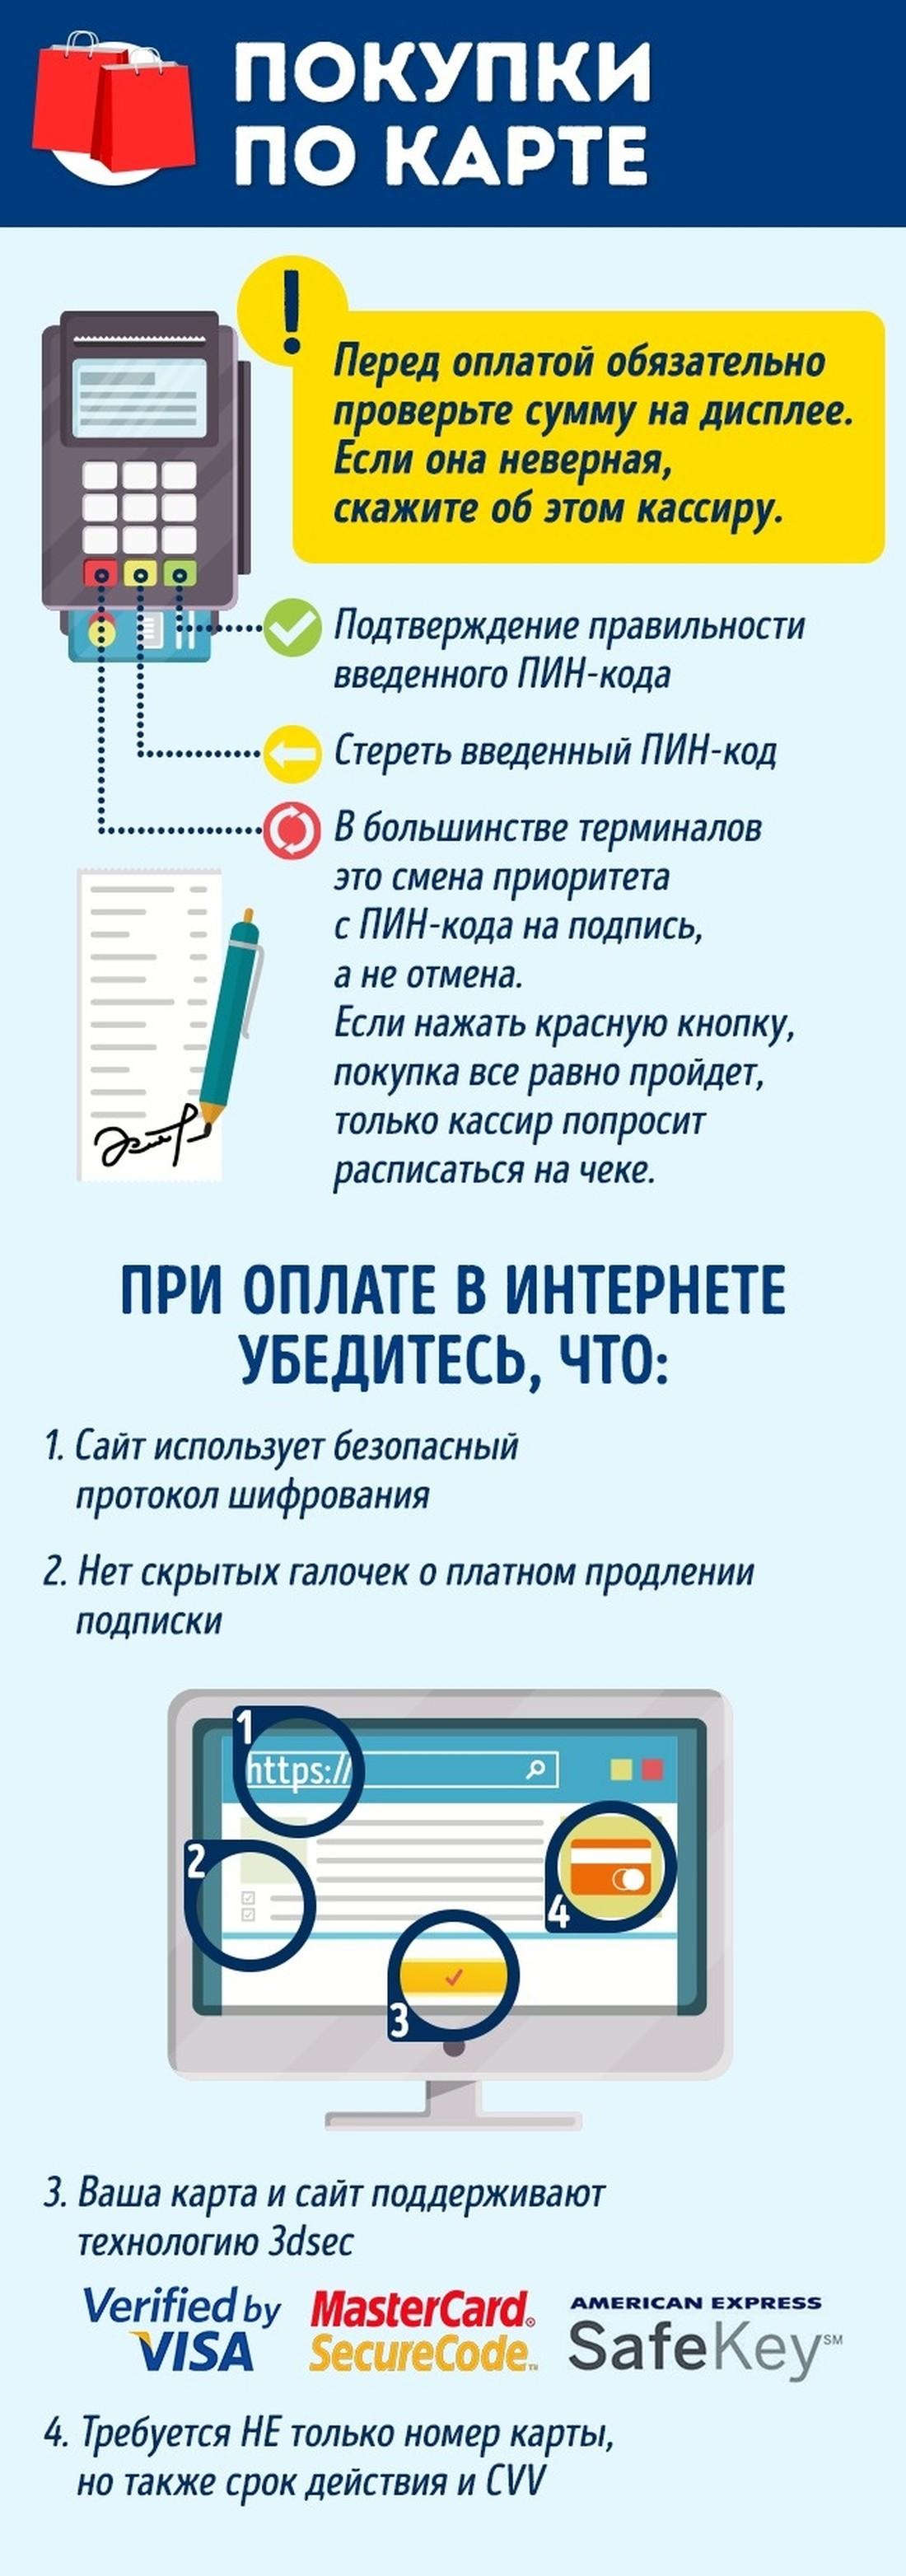 Инфографика: покупки по карте